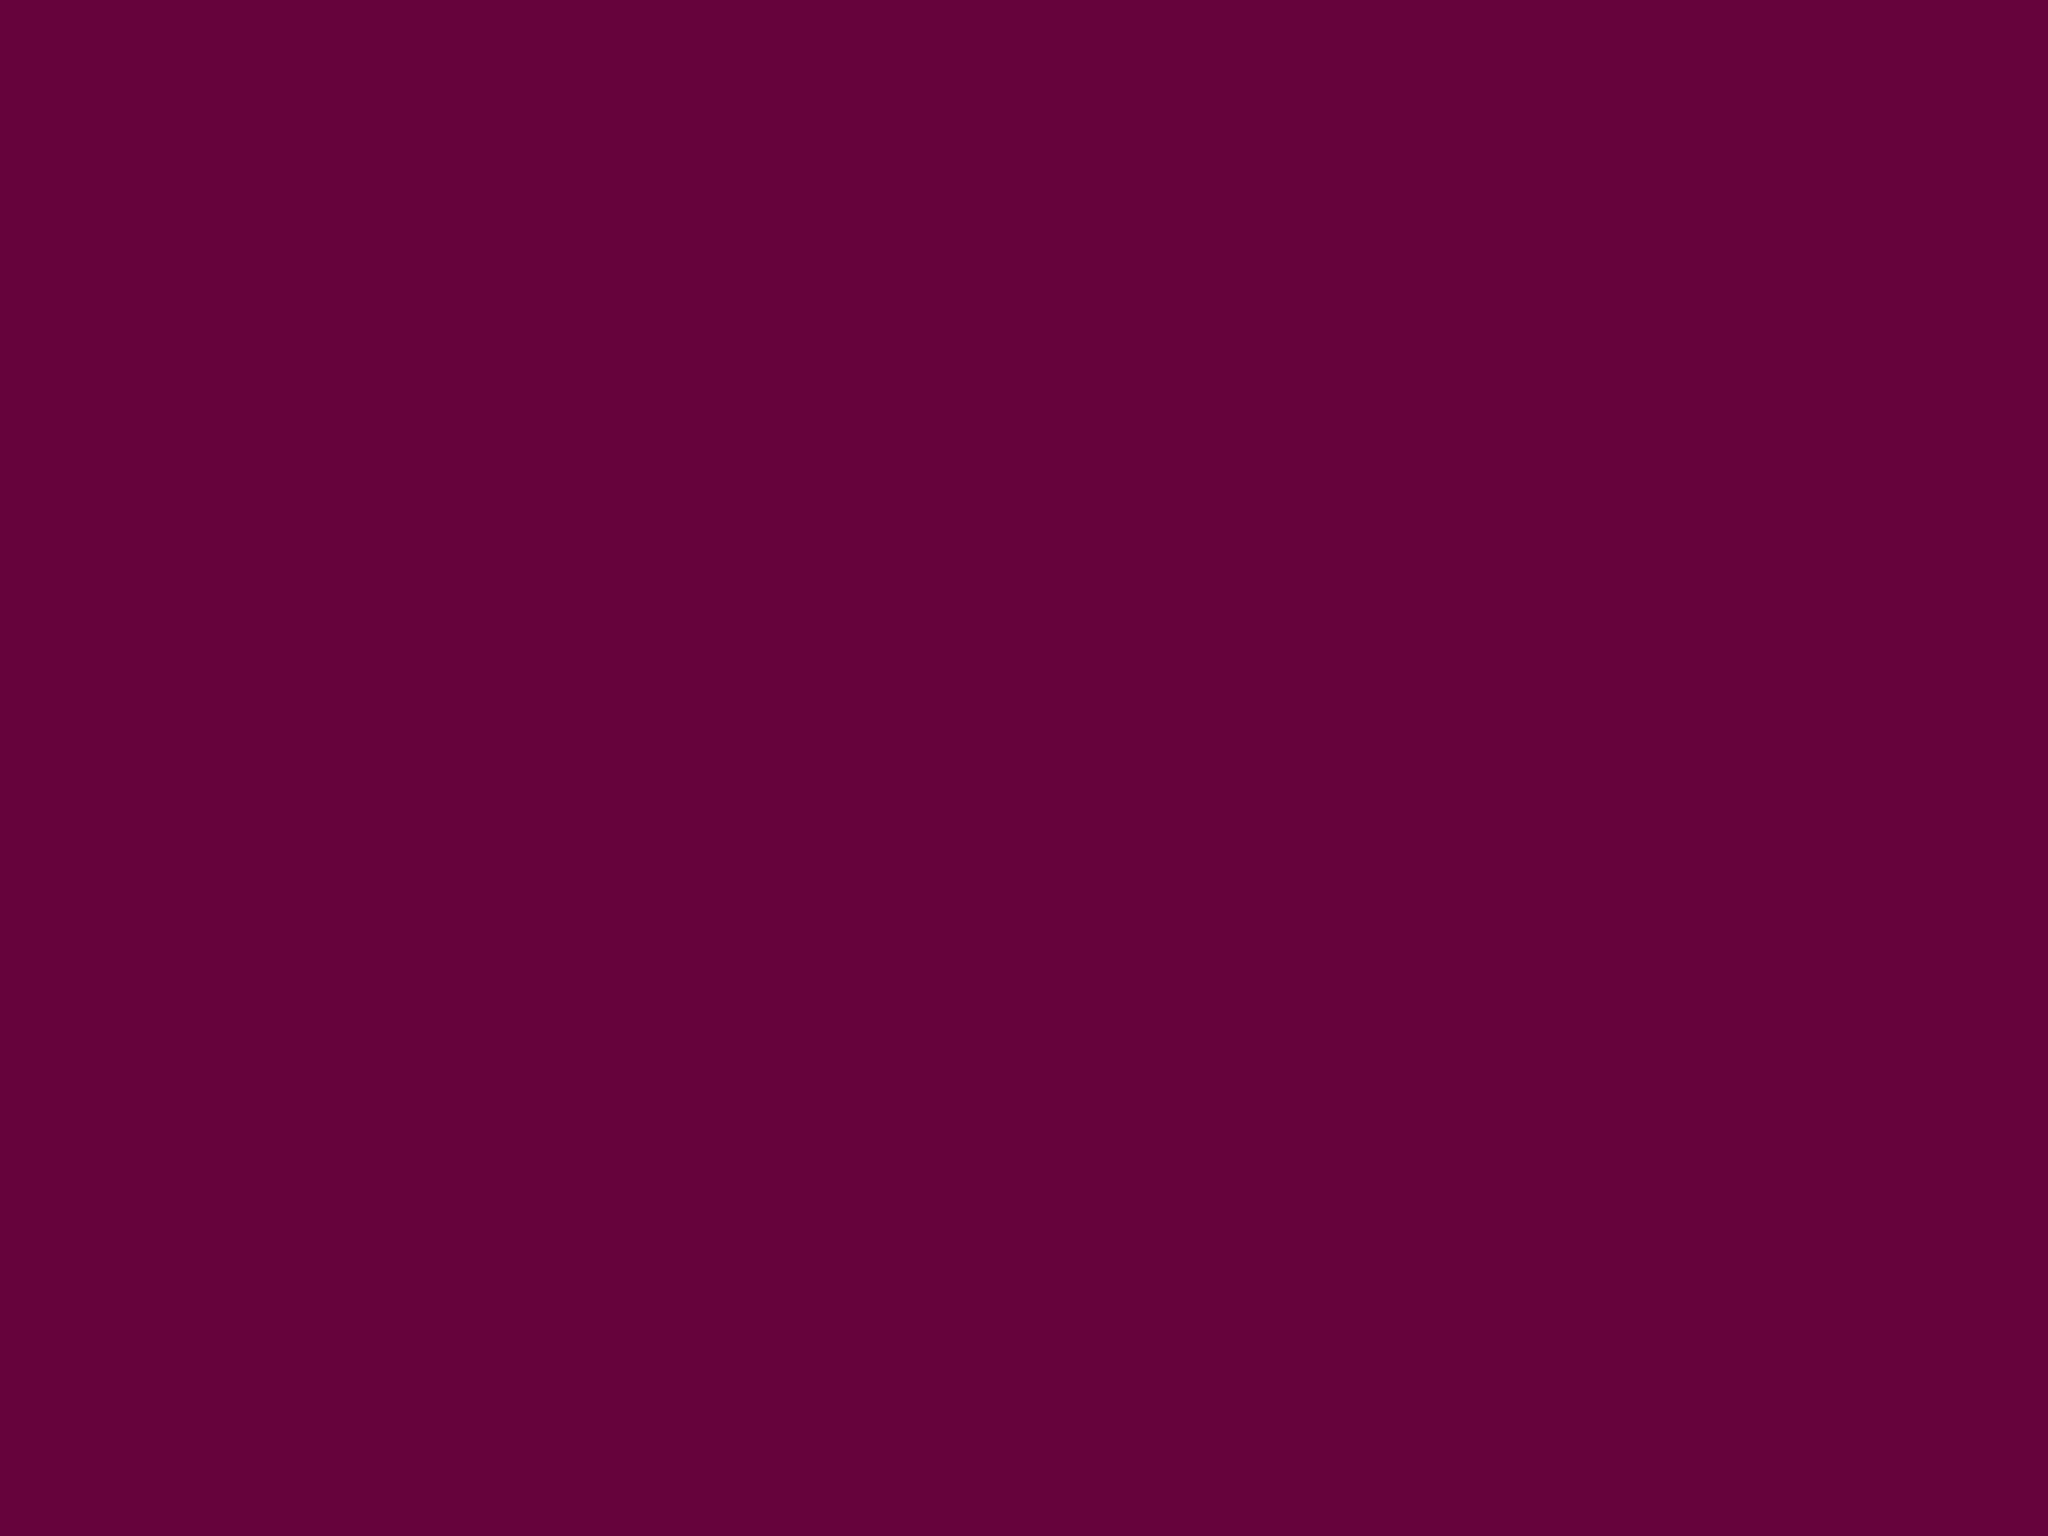 opinions on tyrian purple